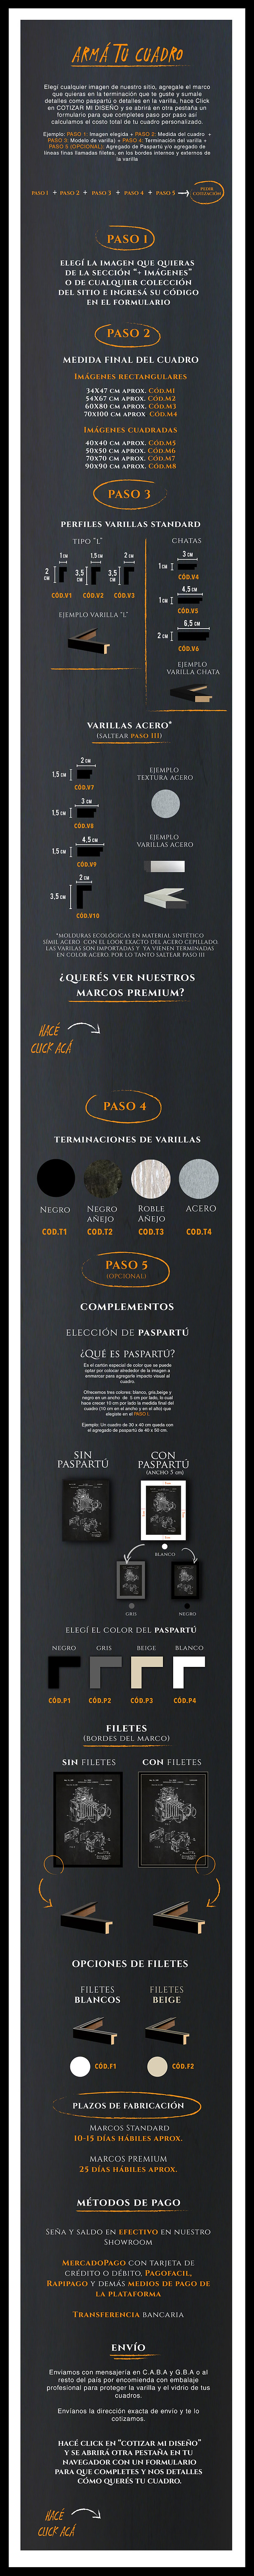 Pasos FINALES Ilustrator.jpg